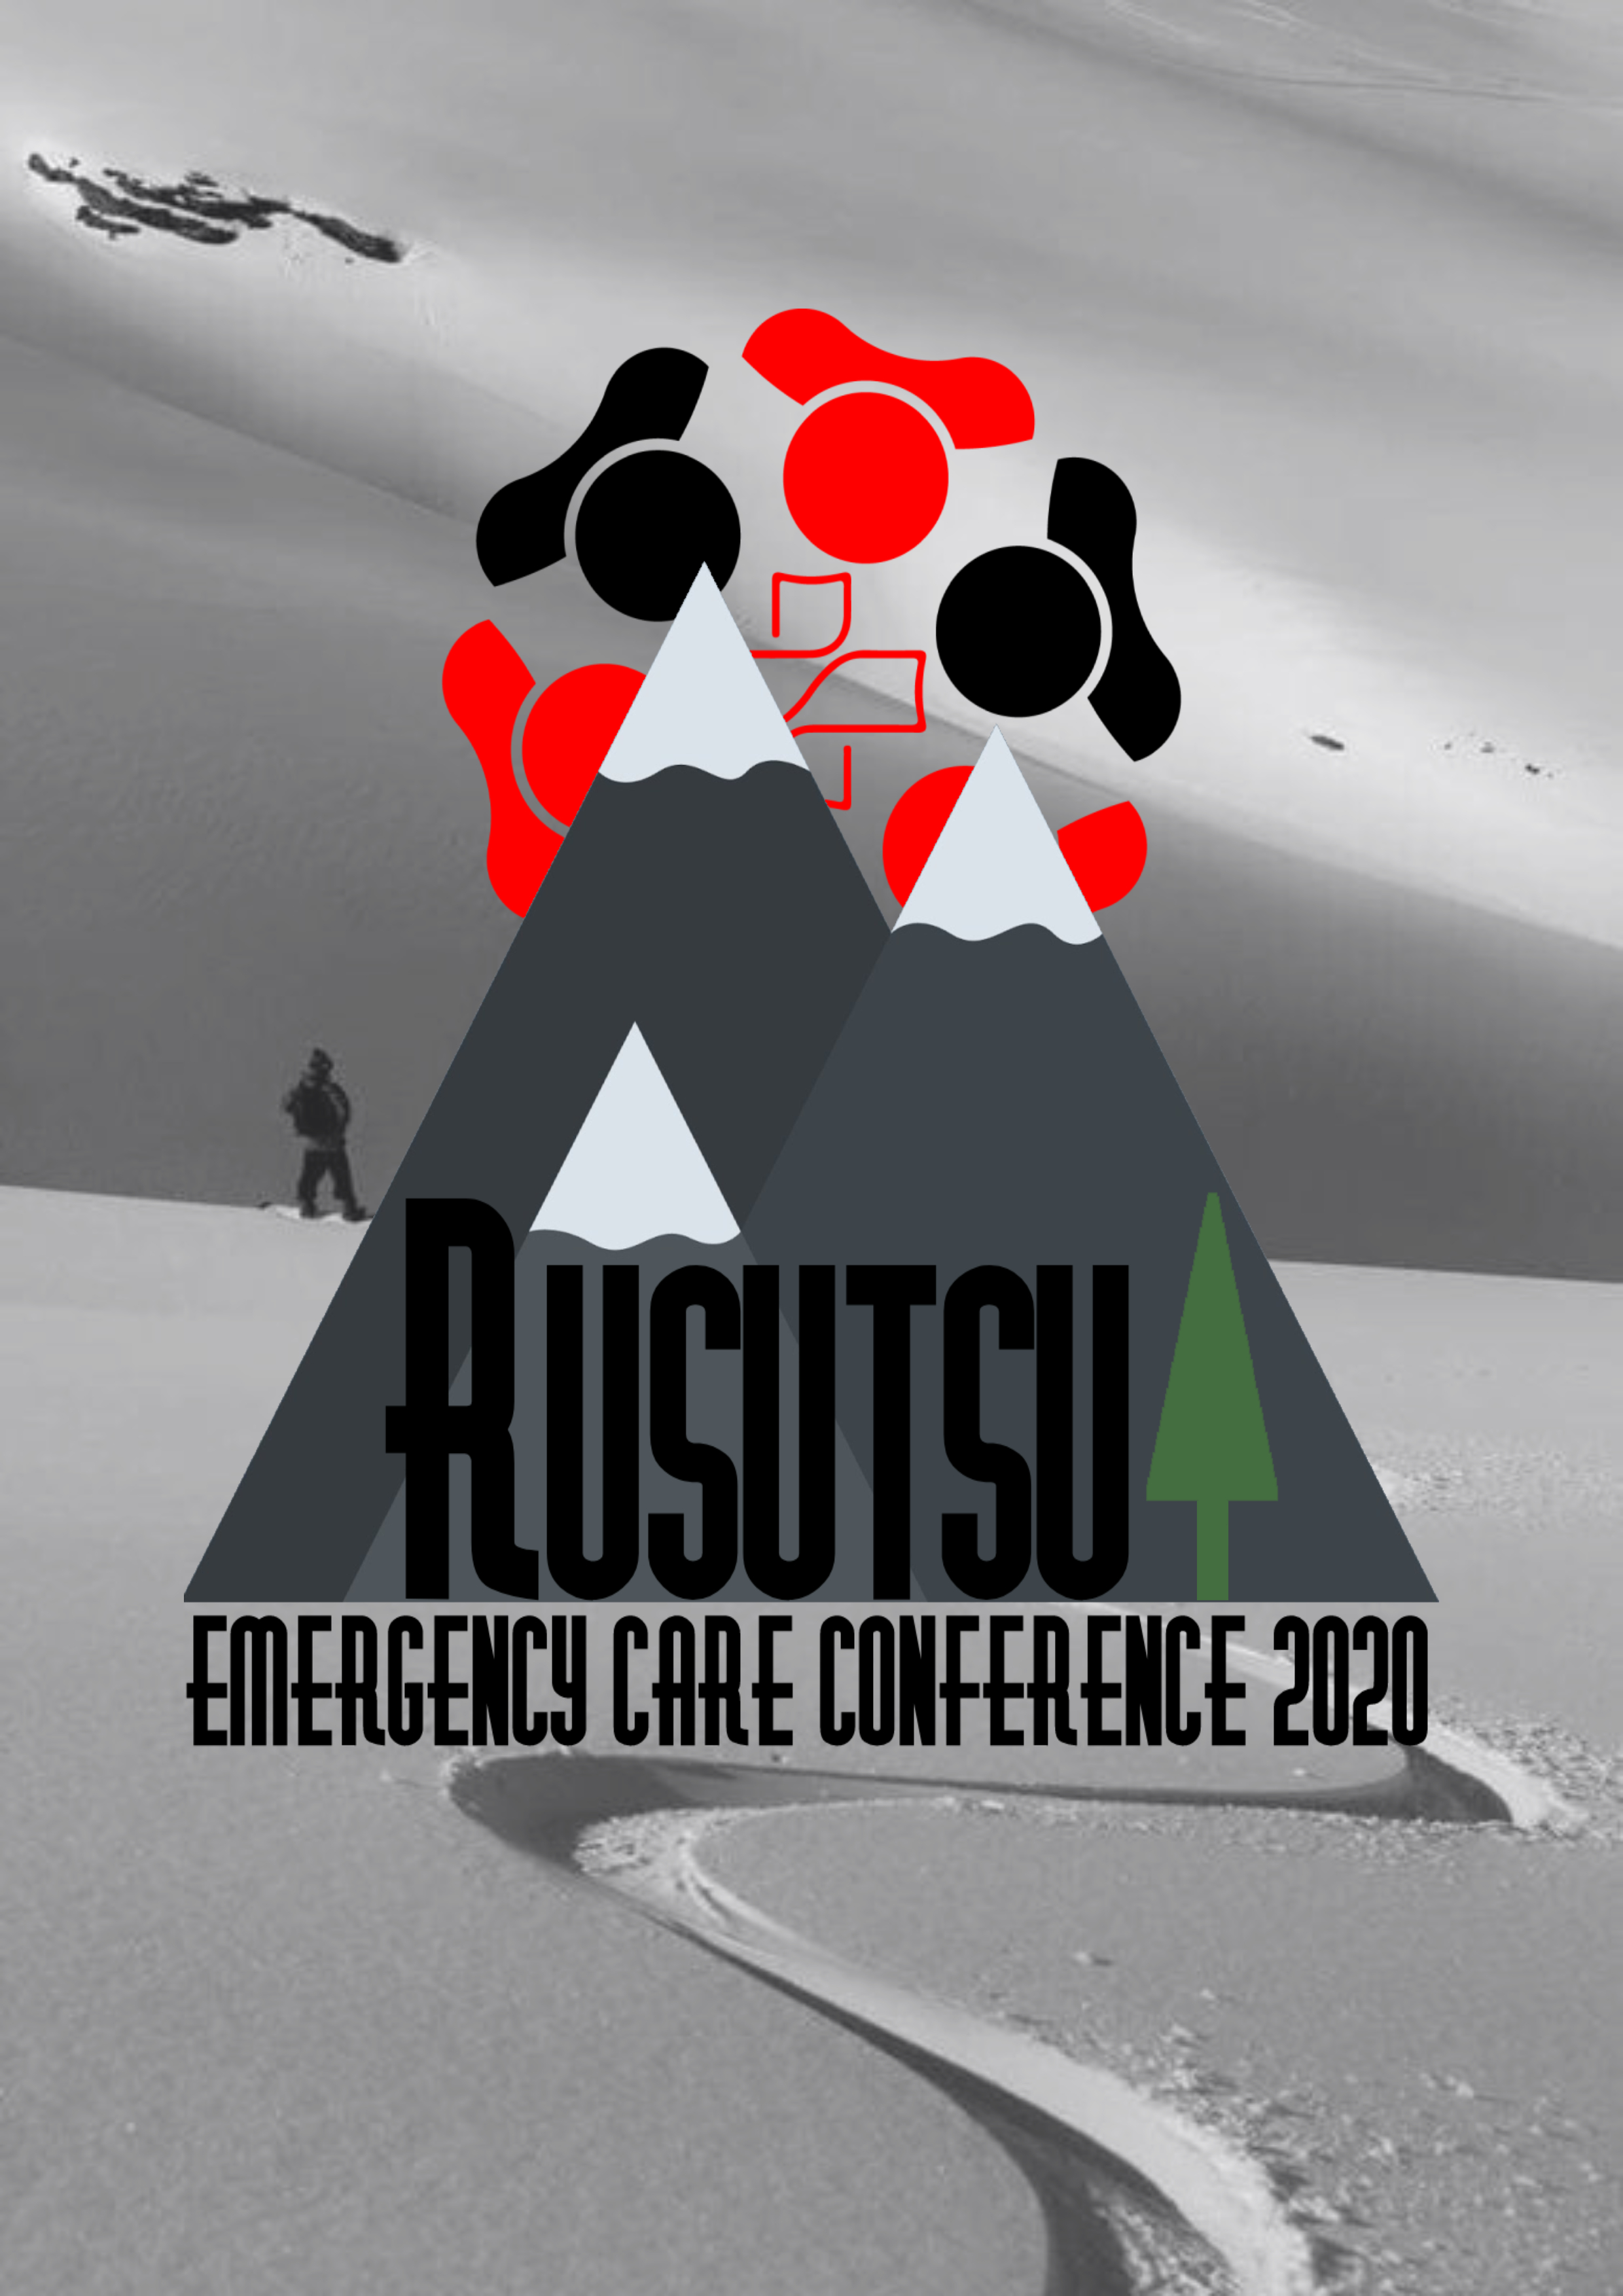 2020 RUSUTSU EMERGENCY CARE CONFERENCE